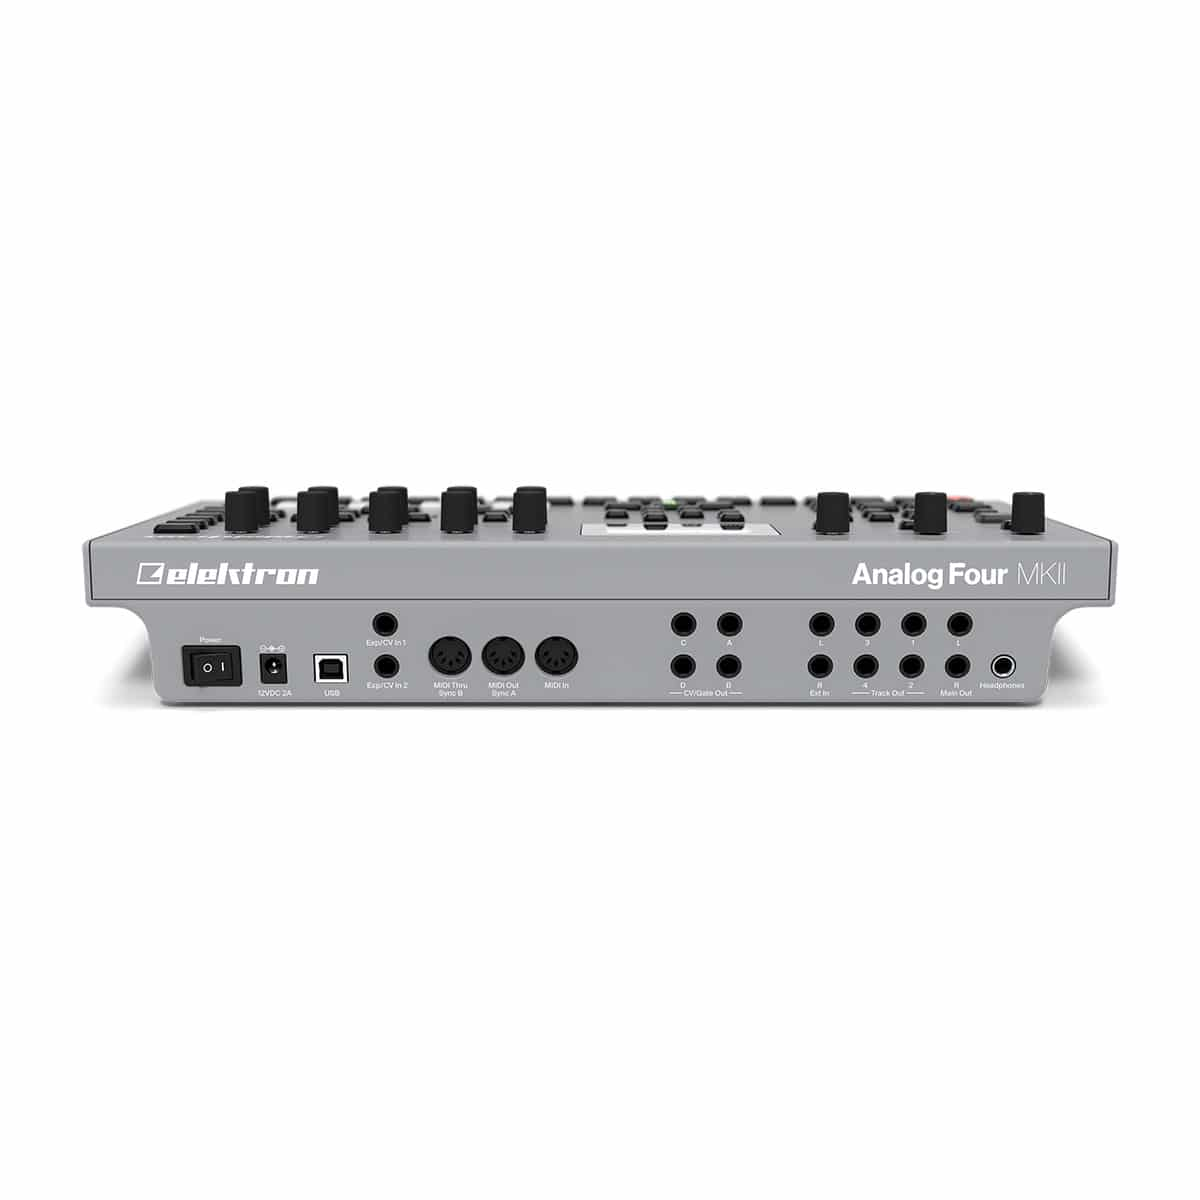 Elektron Analog Four MKII 02 Sintetizzatori e Drum Machine, Sintetizzatori e Tastiere, Synth Desktop